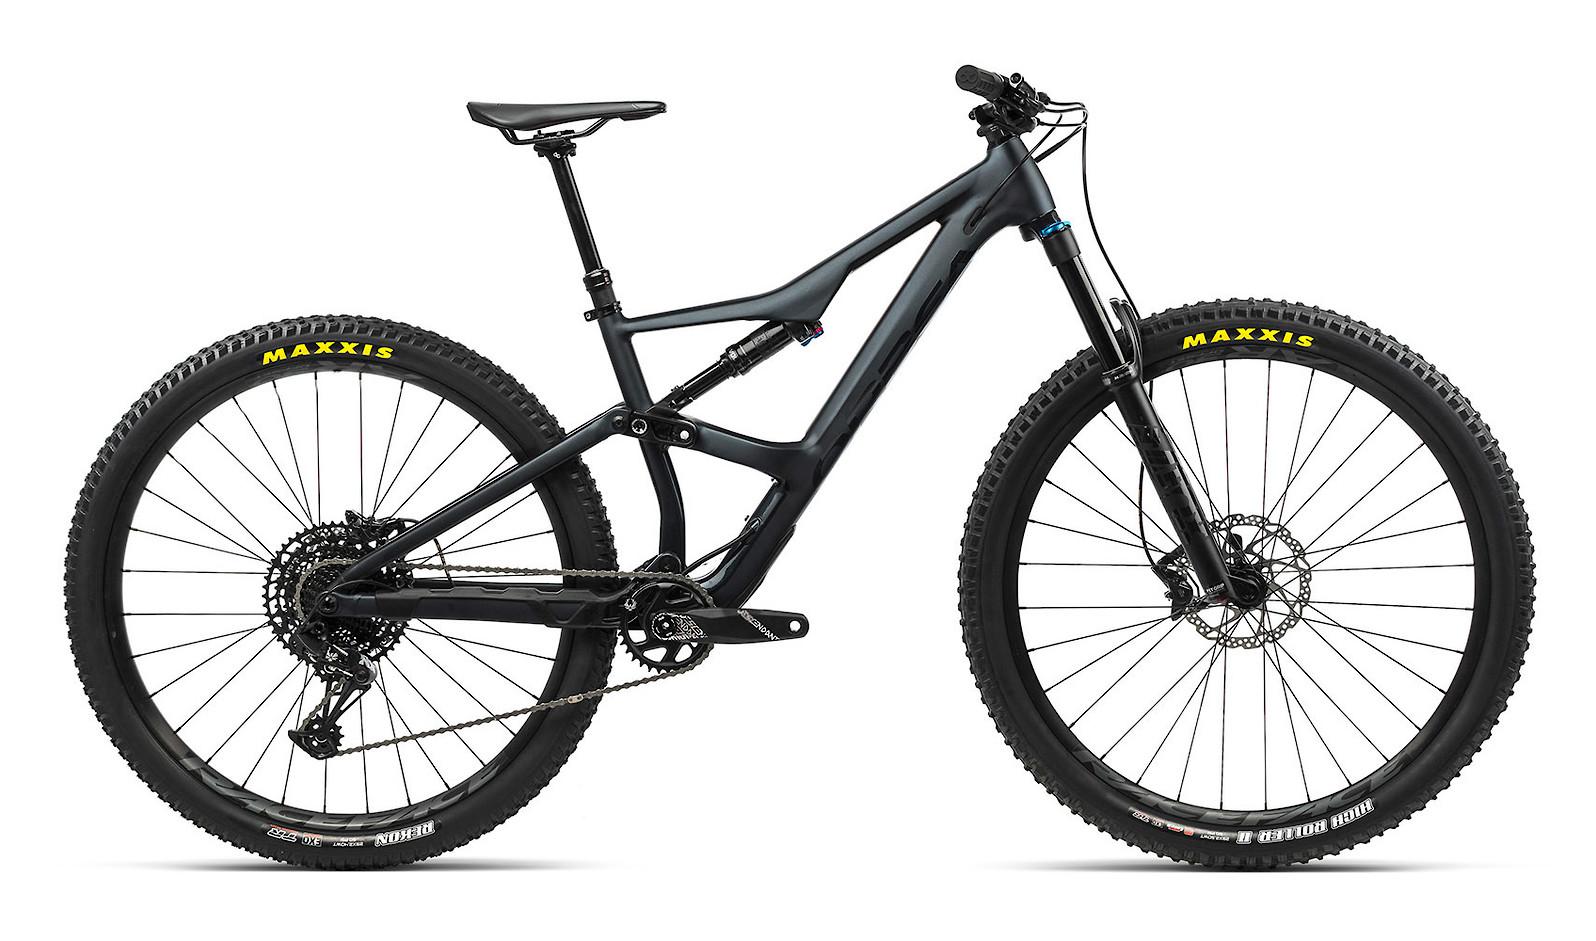 2021 Orbea Occam H20 Eagle (Metallic Black)